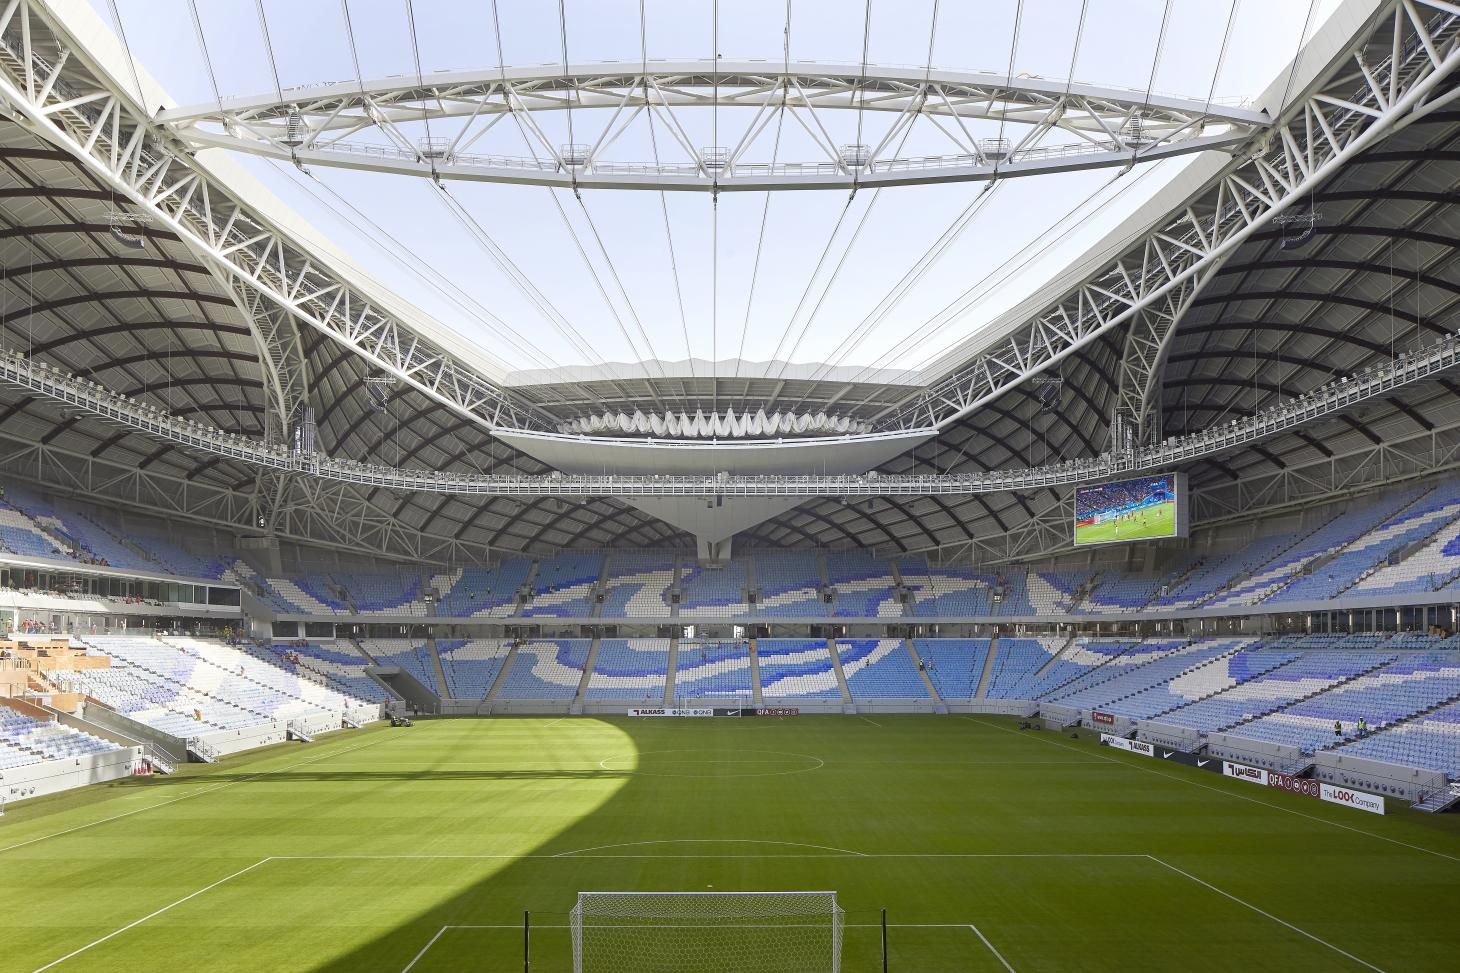 Inside of the new Al-Wakrah Stadium in Doha, Qatar